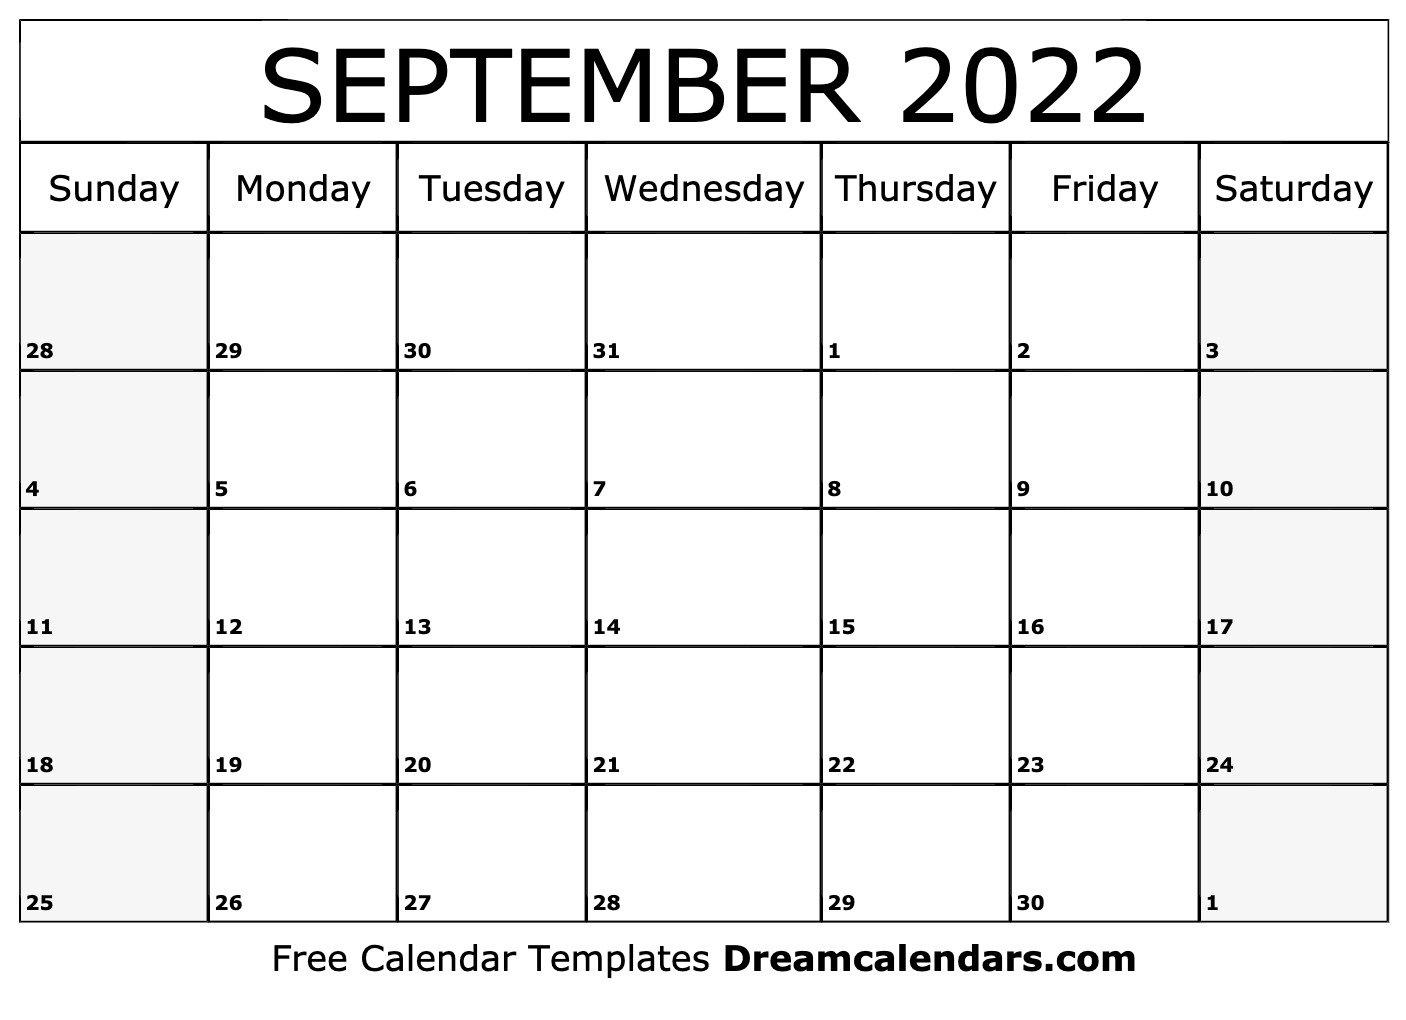 September 2022 Calendar | Free Blank Printable Templates throughout Printable Day Planner 2022